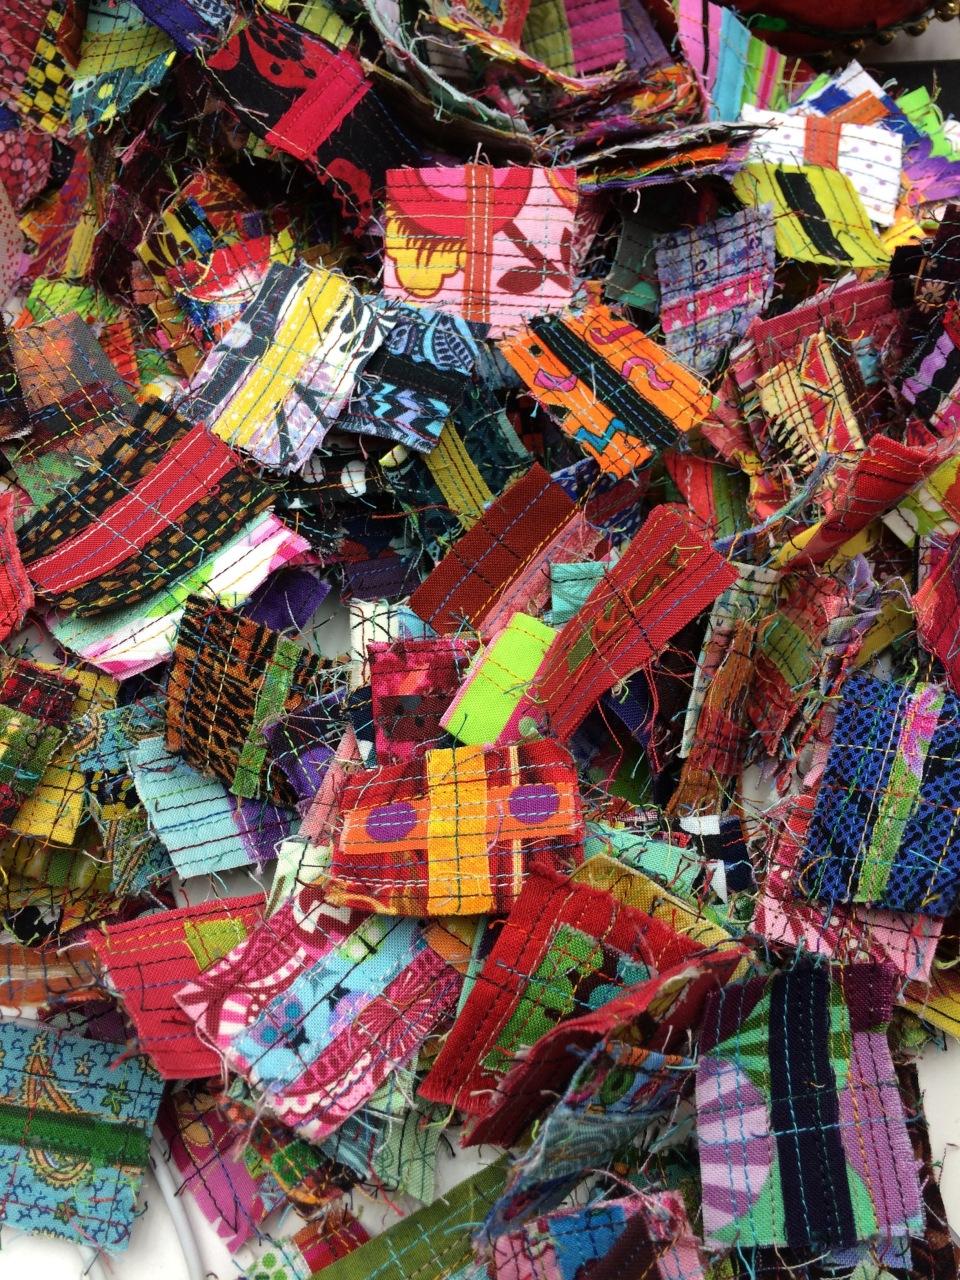 more fabric bits